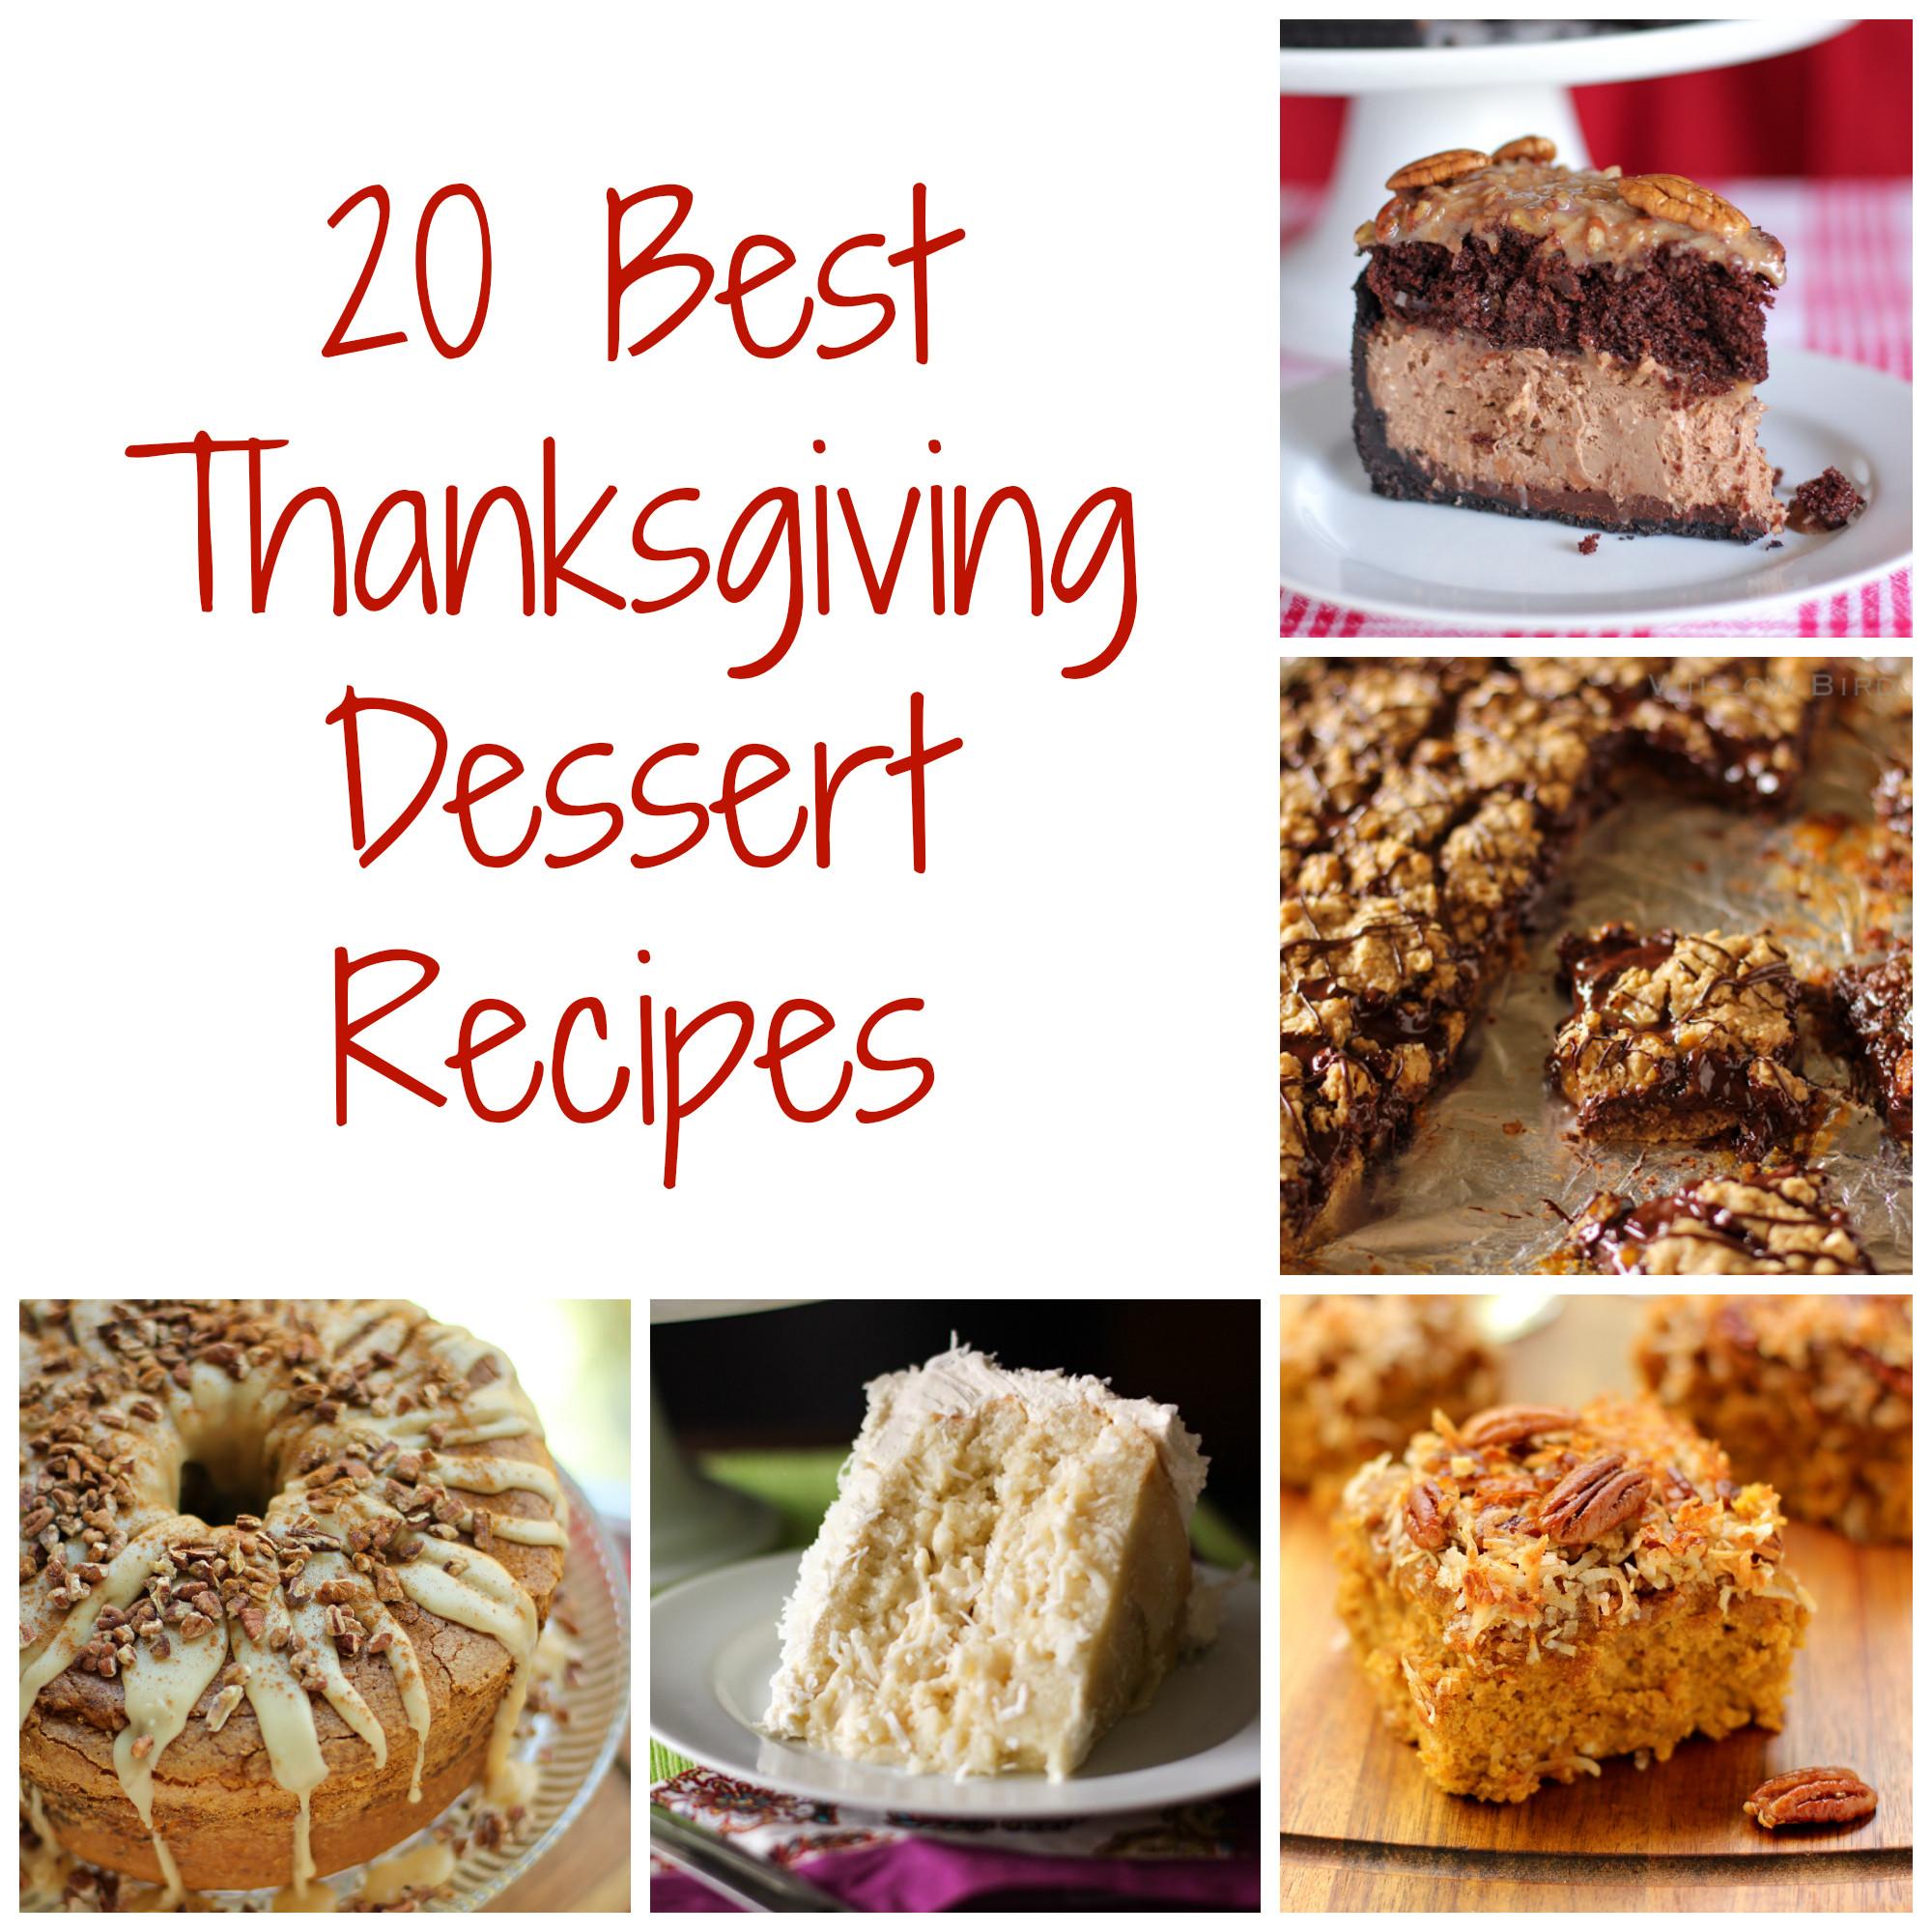 Thanksgiving Desserts Recipes  Thanksgiving Dessert Recipes Willow Bird Baking